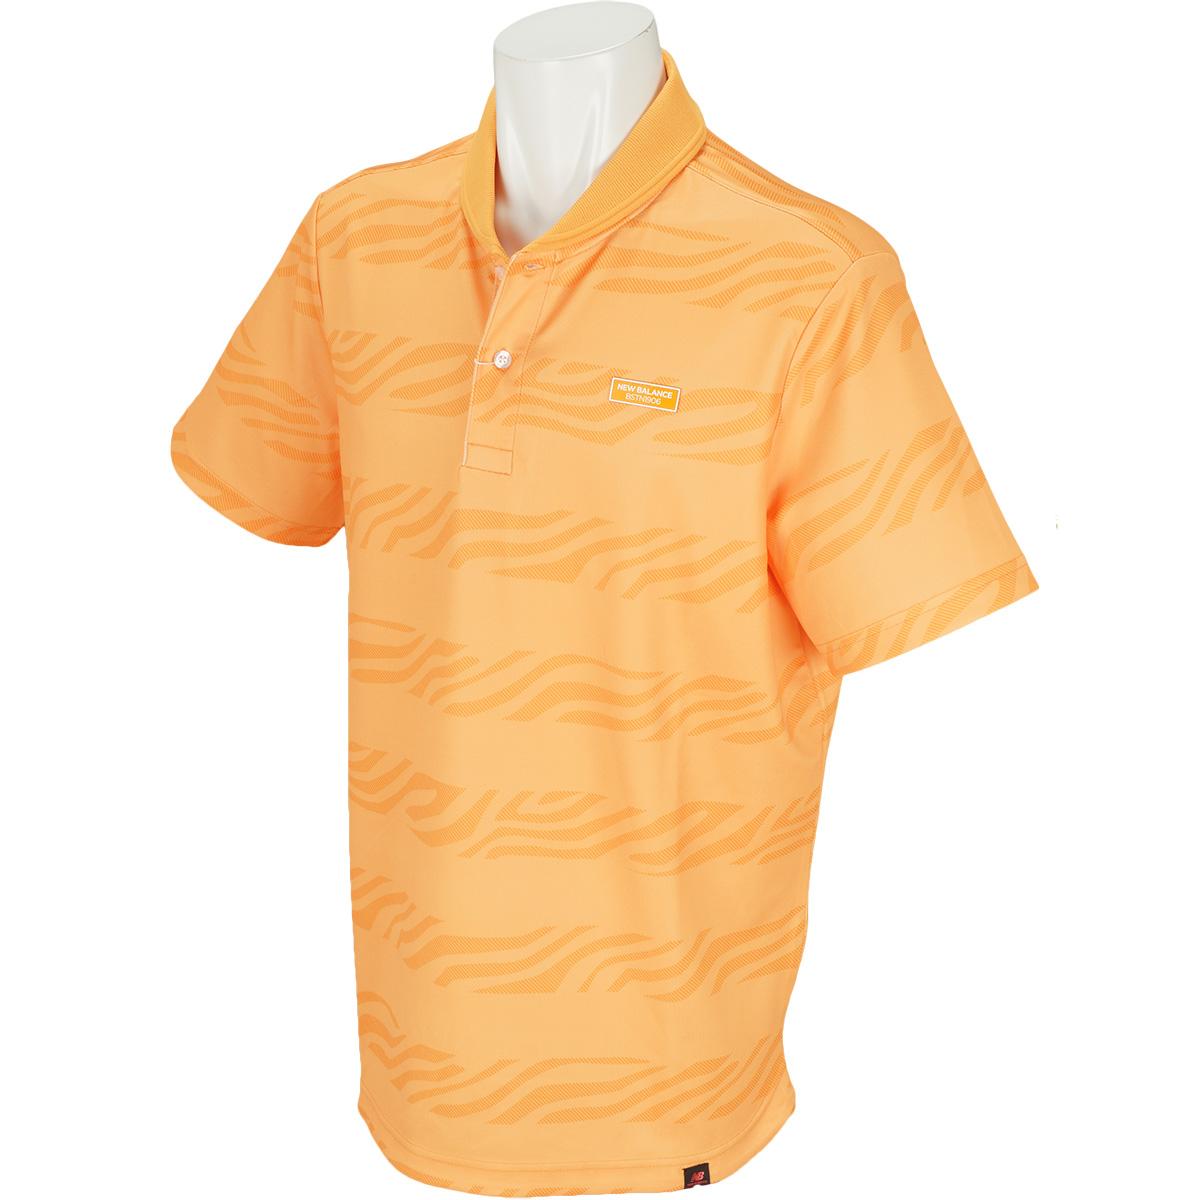 METRO 変形鹿の子 ゼブラボーダープリント半袖ポロシャツ